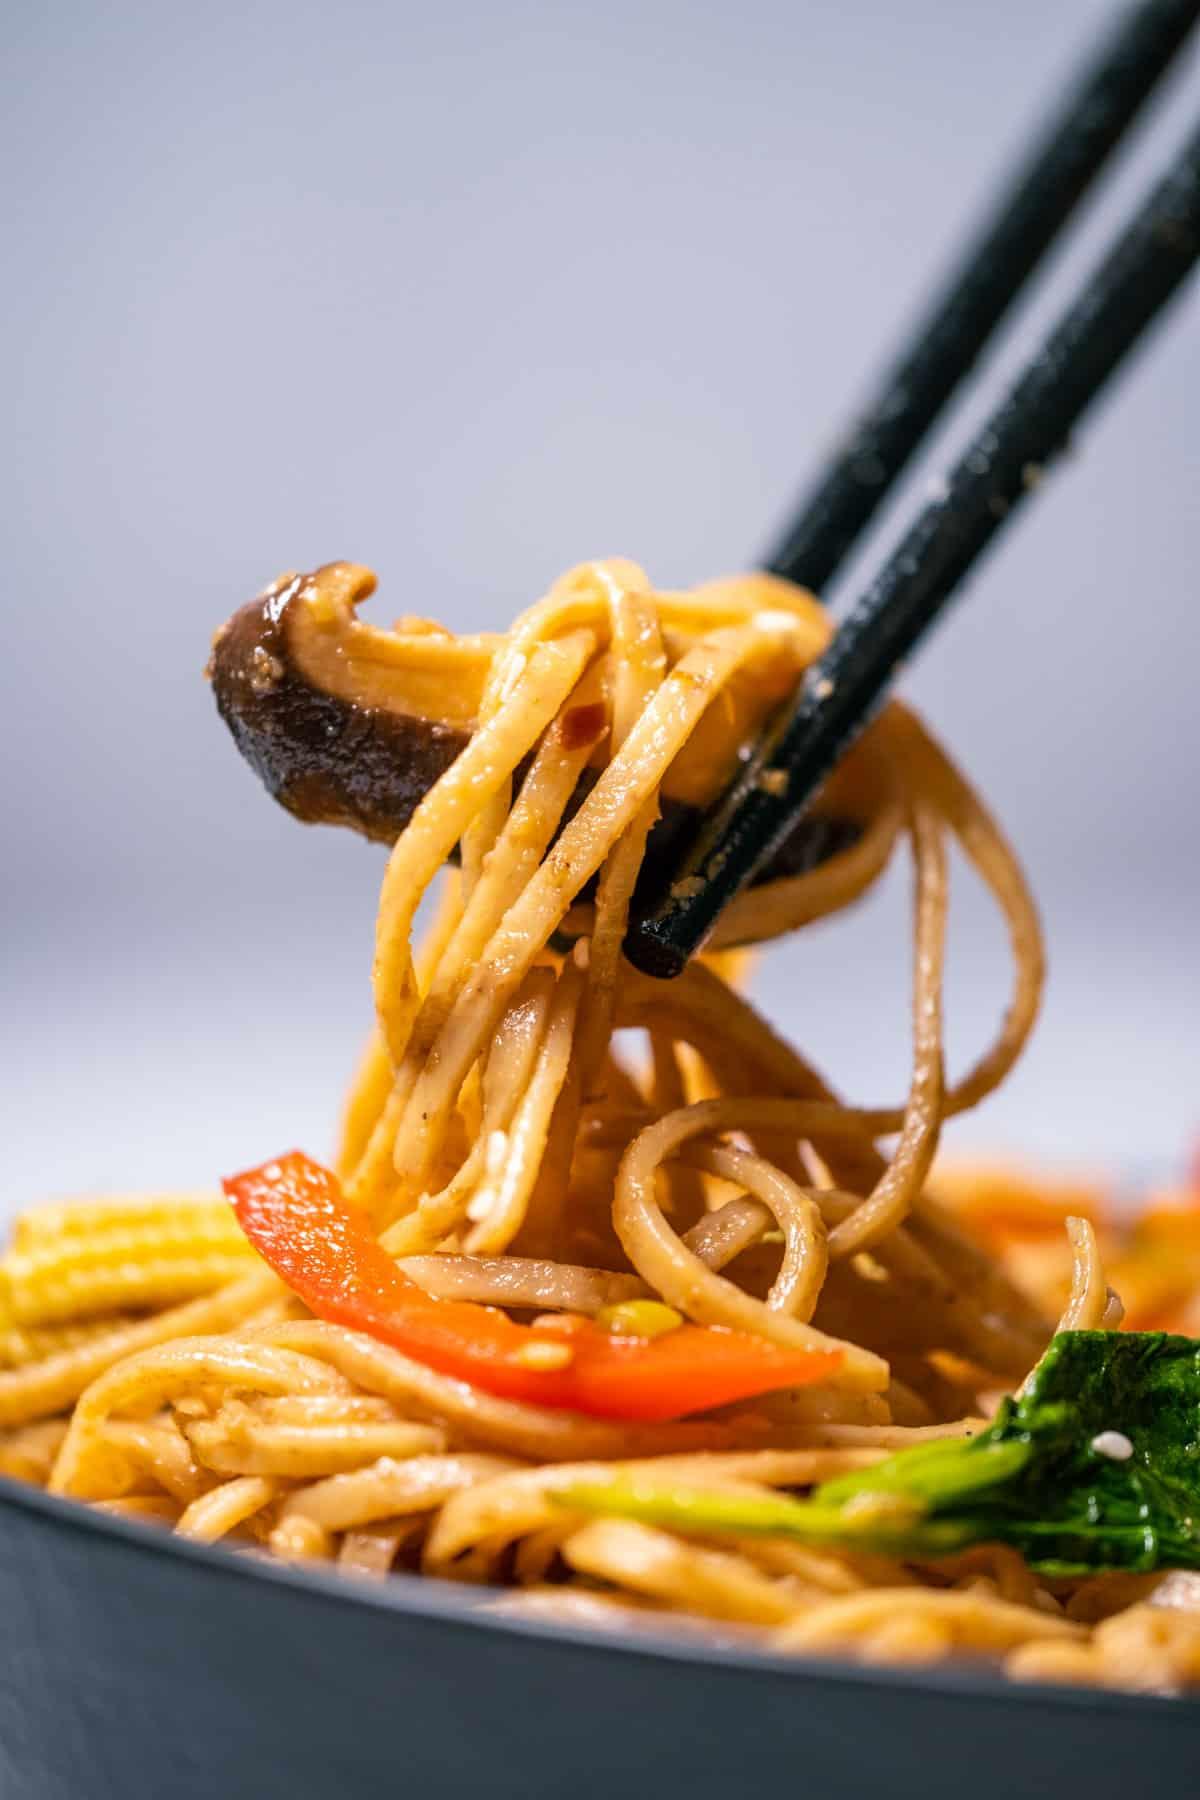 Chopsticks lifting vegan lo mein out of a black bowl.